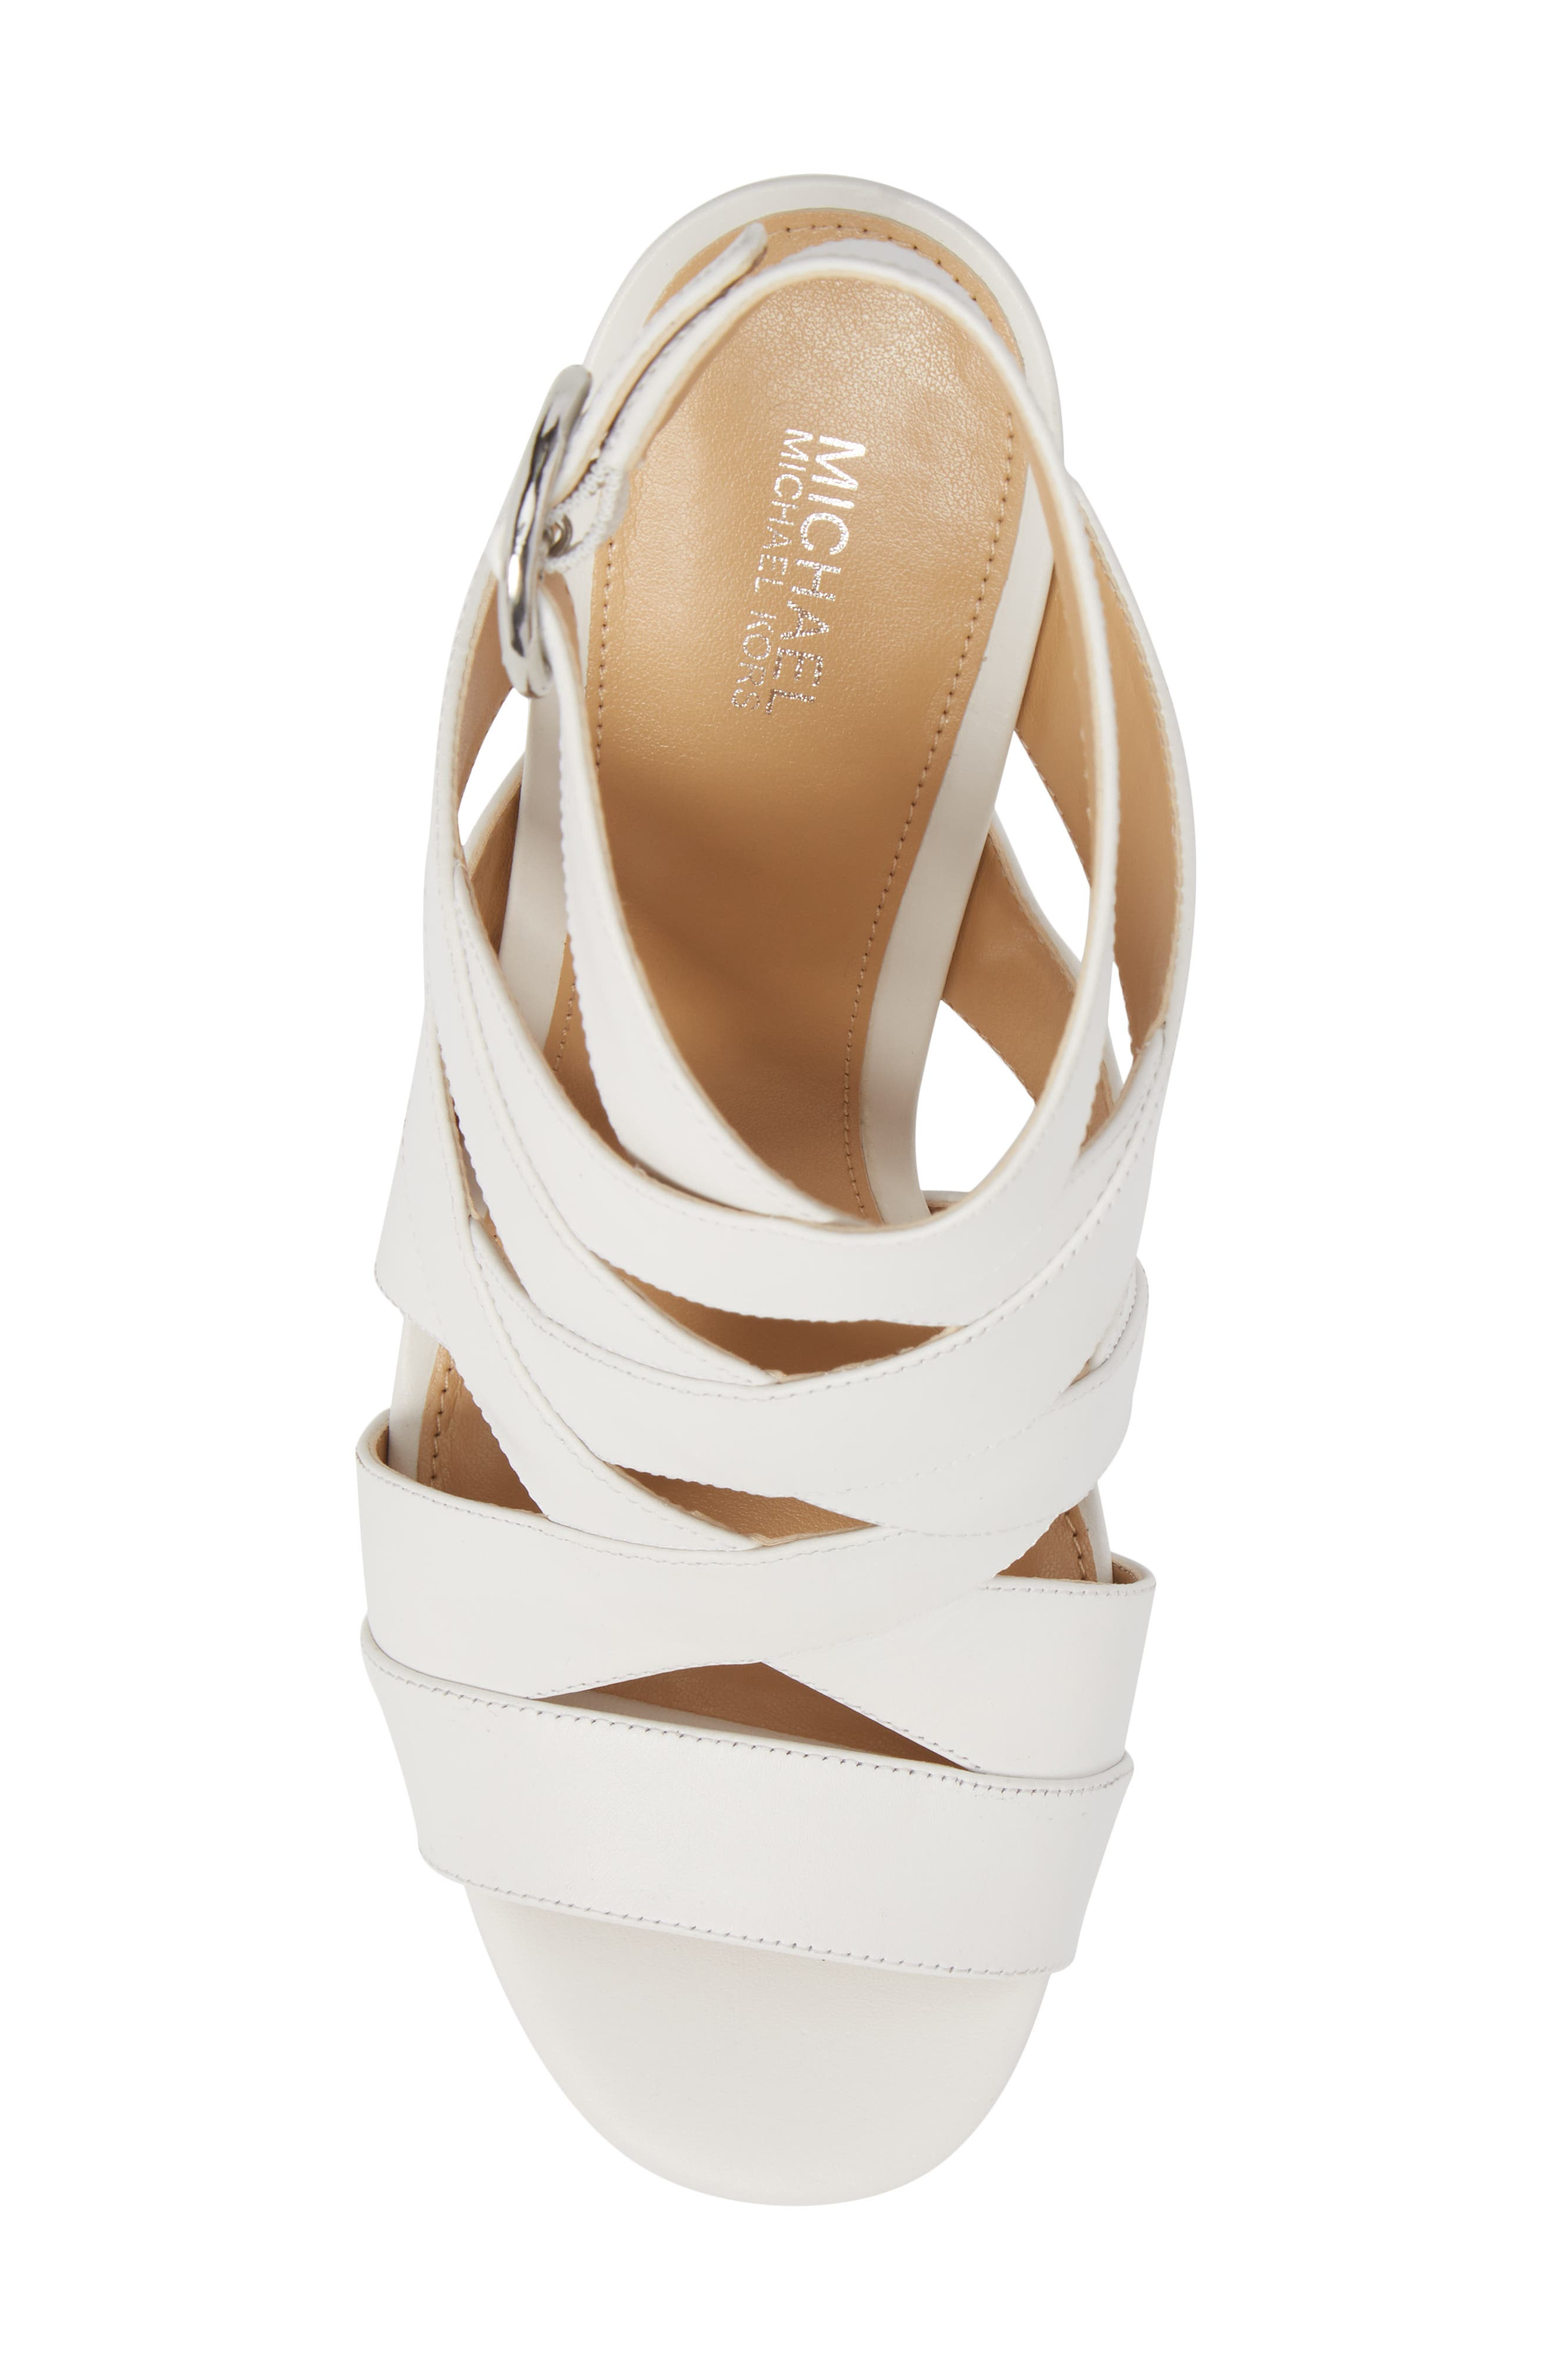 Alana Sandal,                             Alternate thumbnail 5, color,                             Optic White Leather